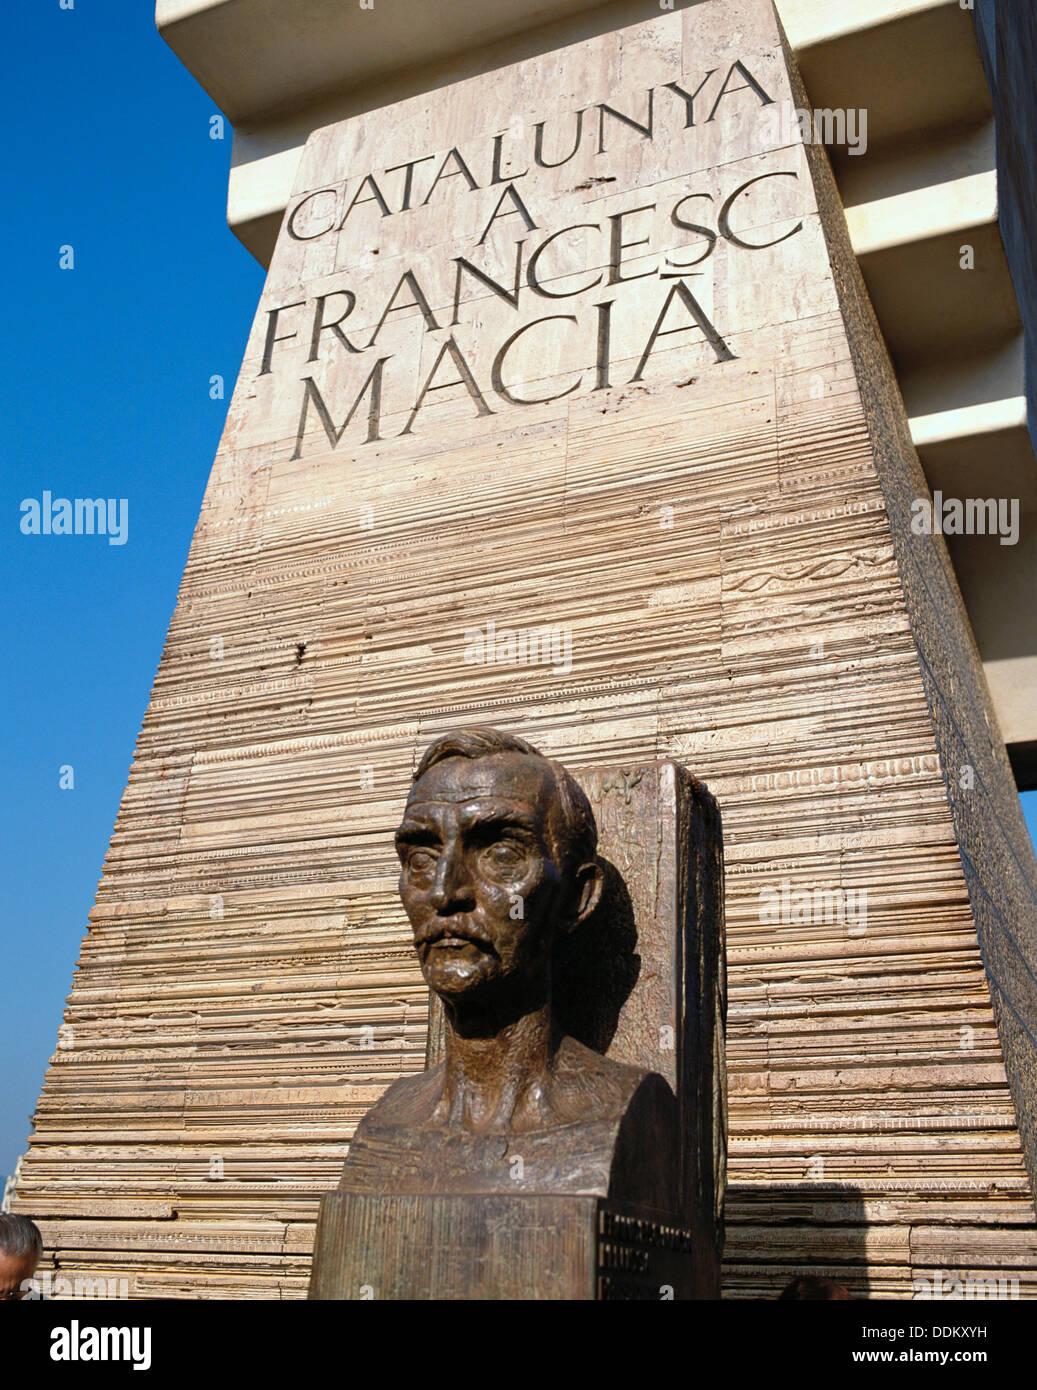 Monument to Catalan political leader Francesc Macià by sculptor Josep Maria Subirachs. Plaça de Catalunya. Barcelona, Spain - Stock Image